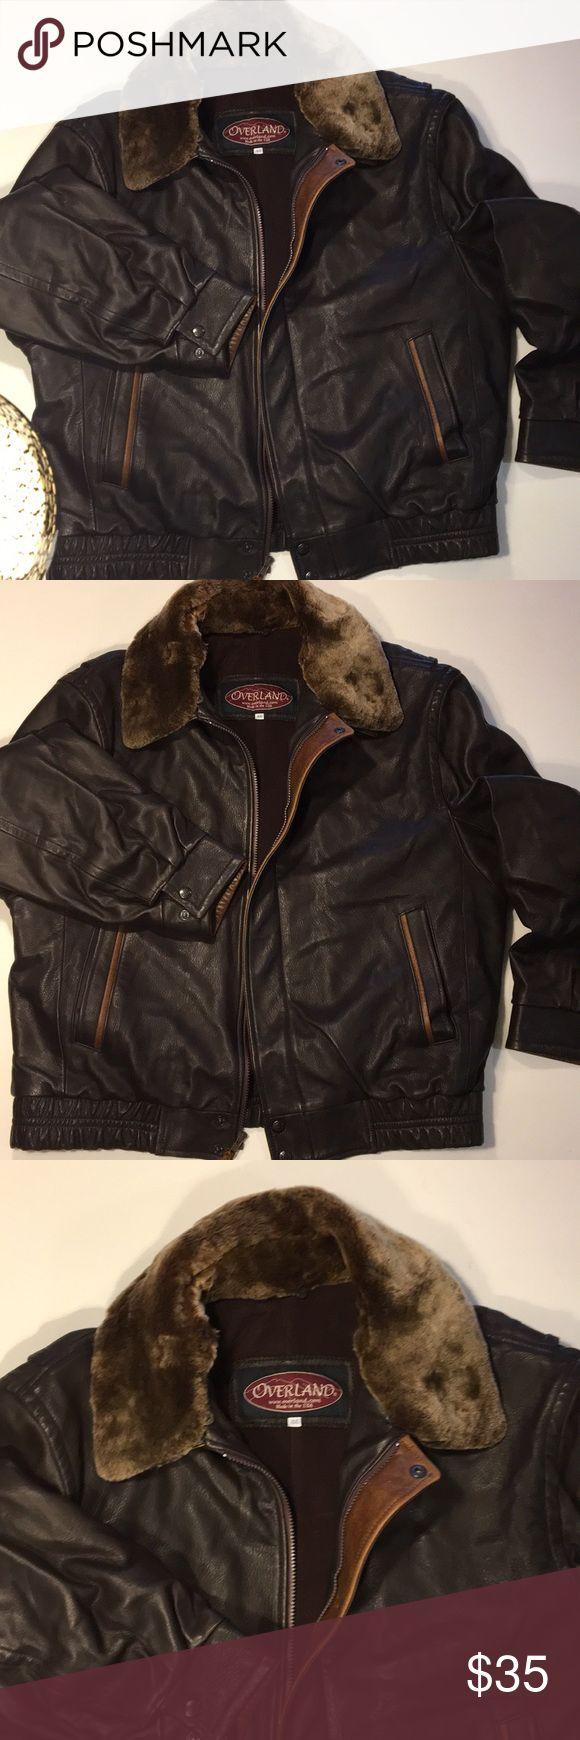 Overland Leather Jackets men's 46!!!! 3 day sale! Men's